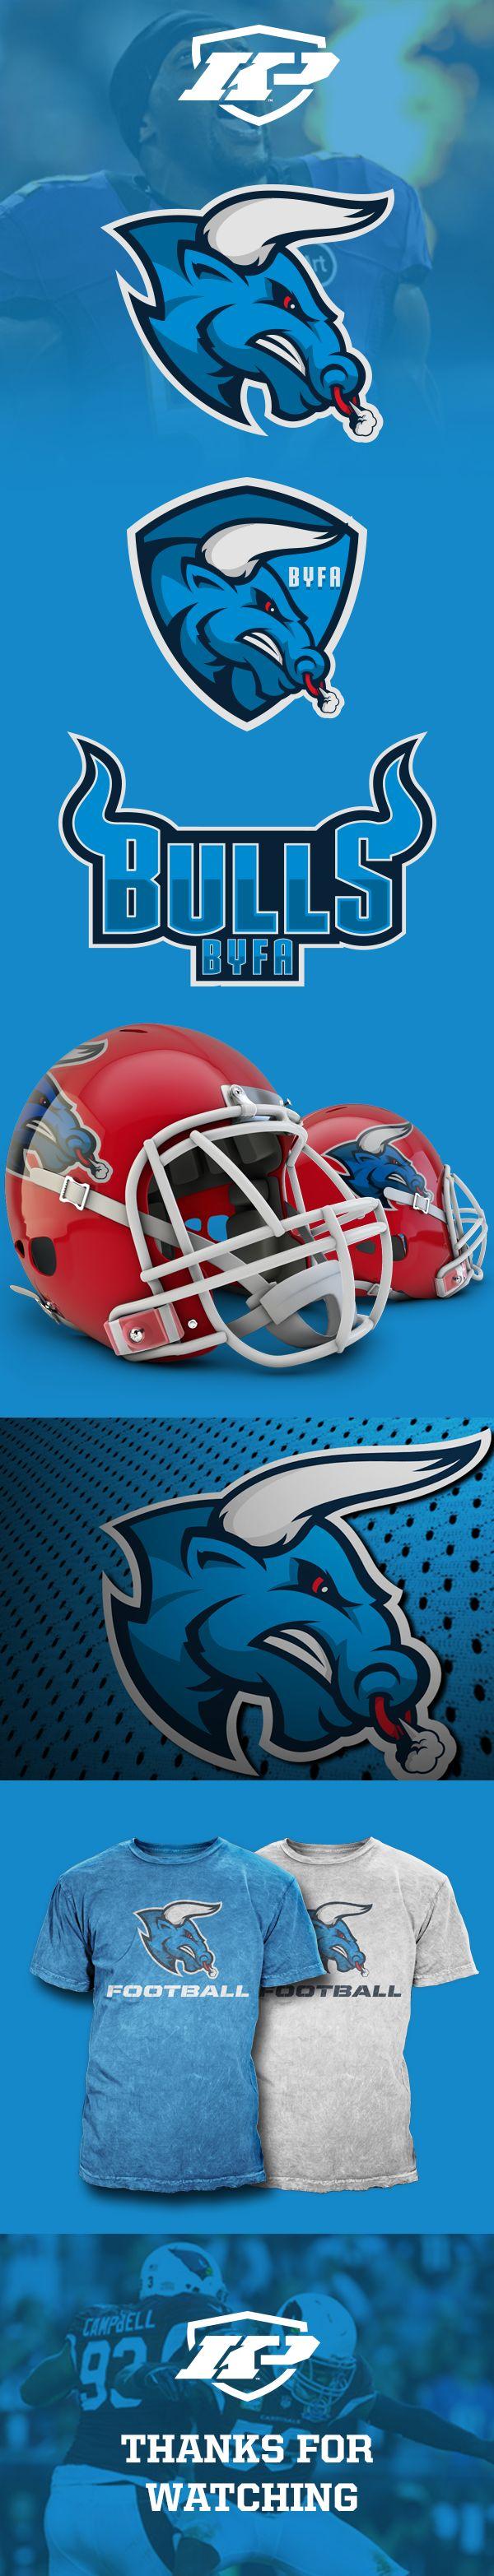 sports design and marketing graphics BULLS by Khisnen Pauvaday, via Behance